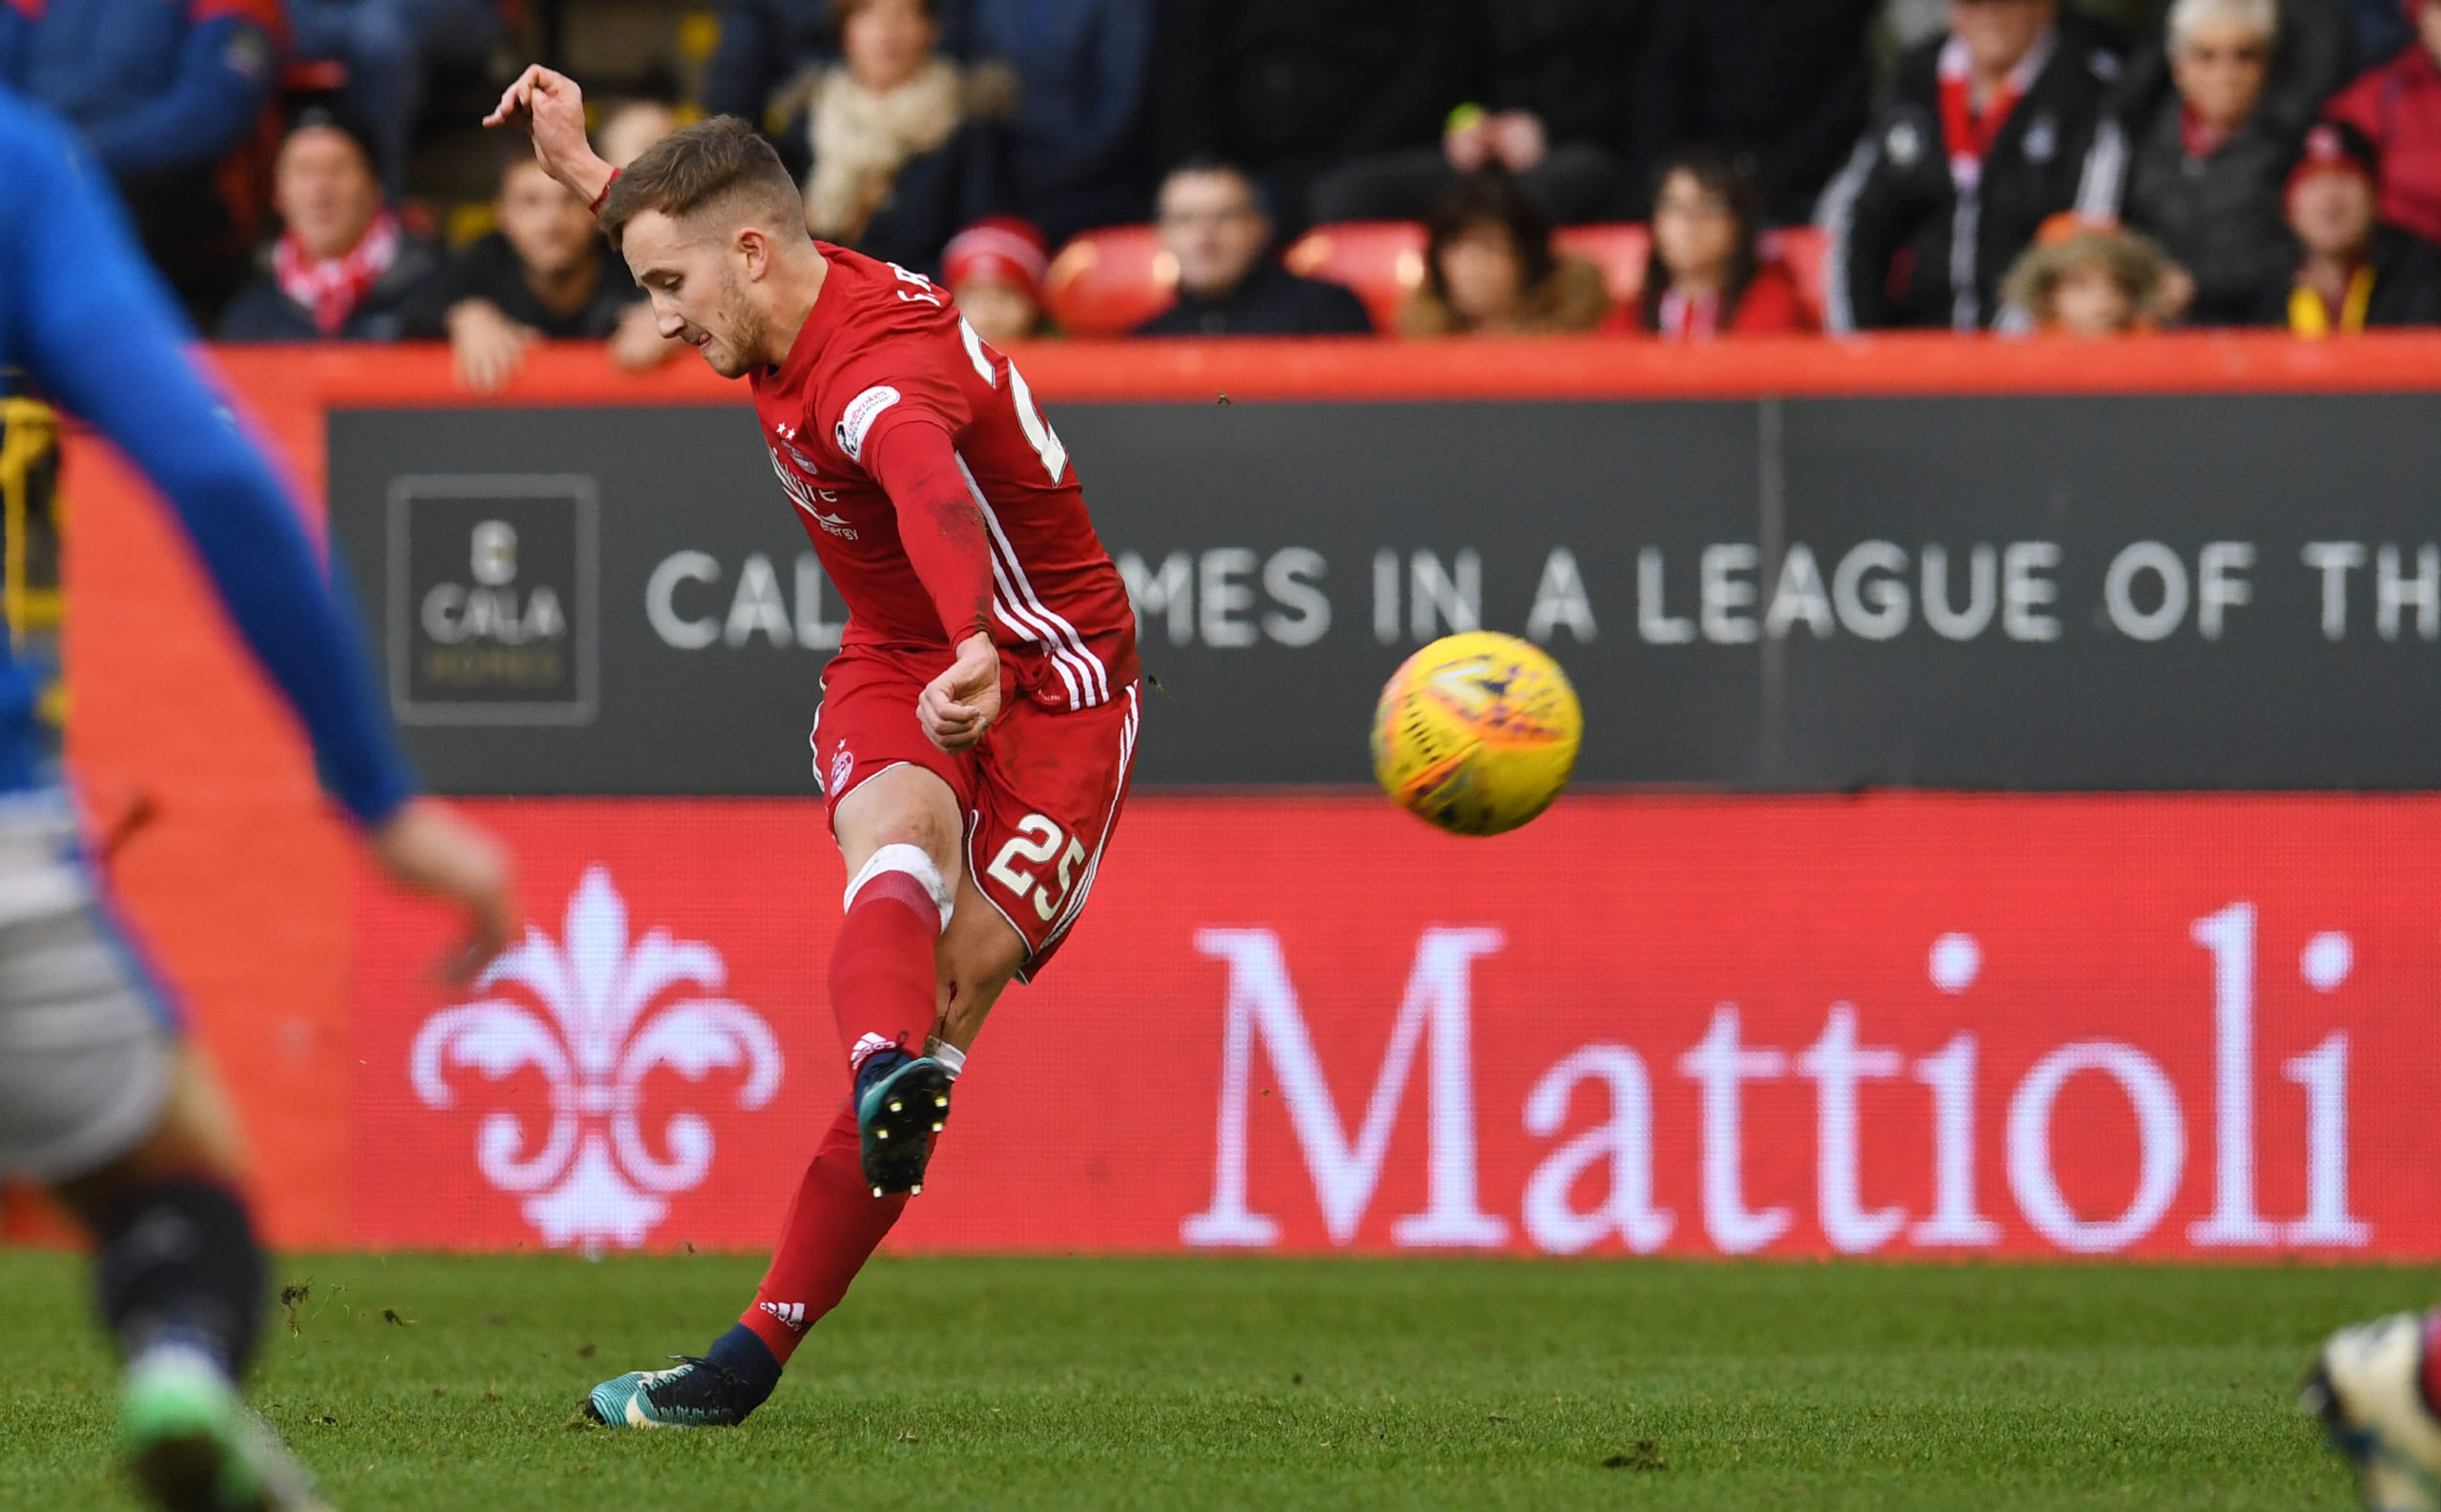 Frank Ross strikes his free-kick against Rangers